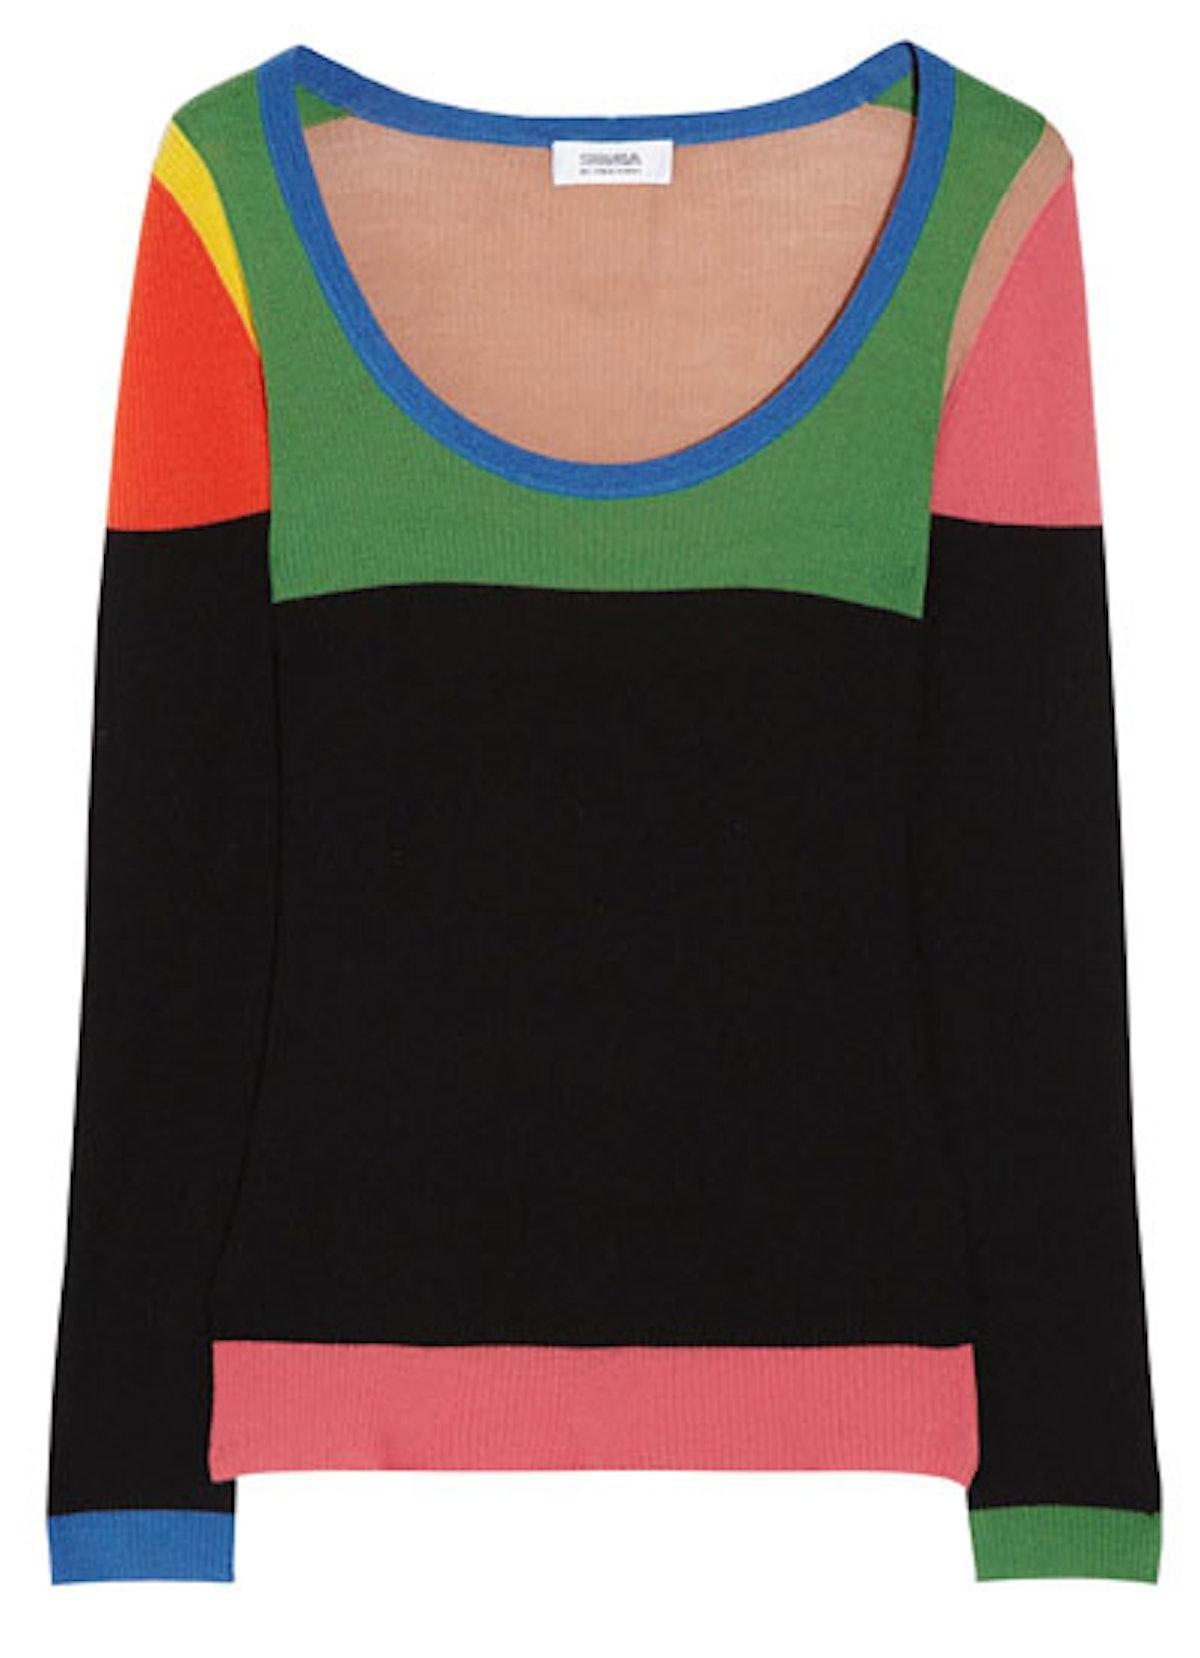 fass-graphic-knits-07-v.jpg